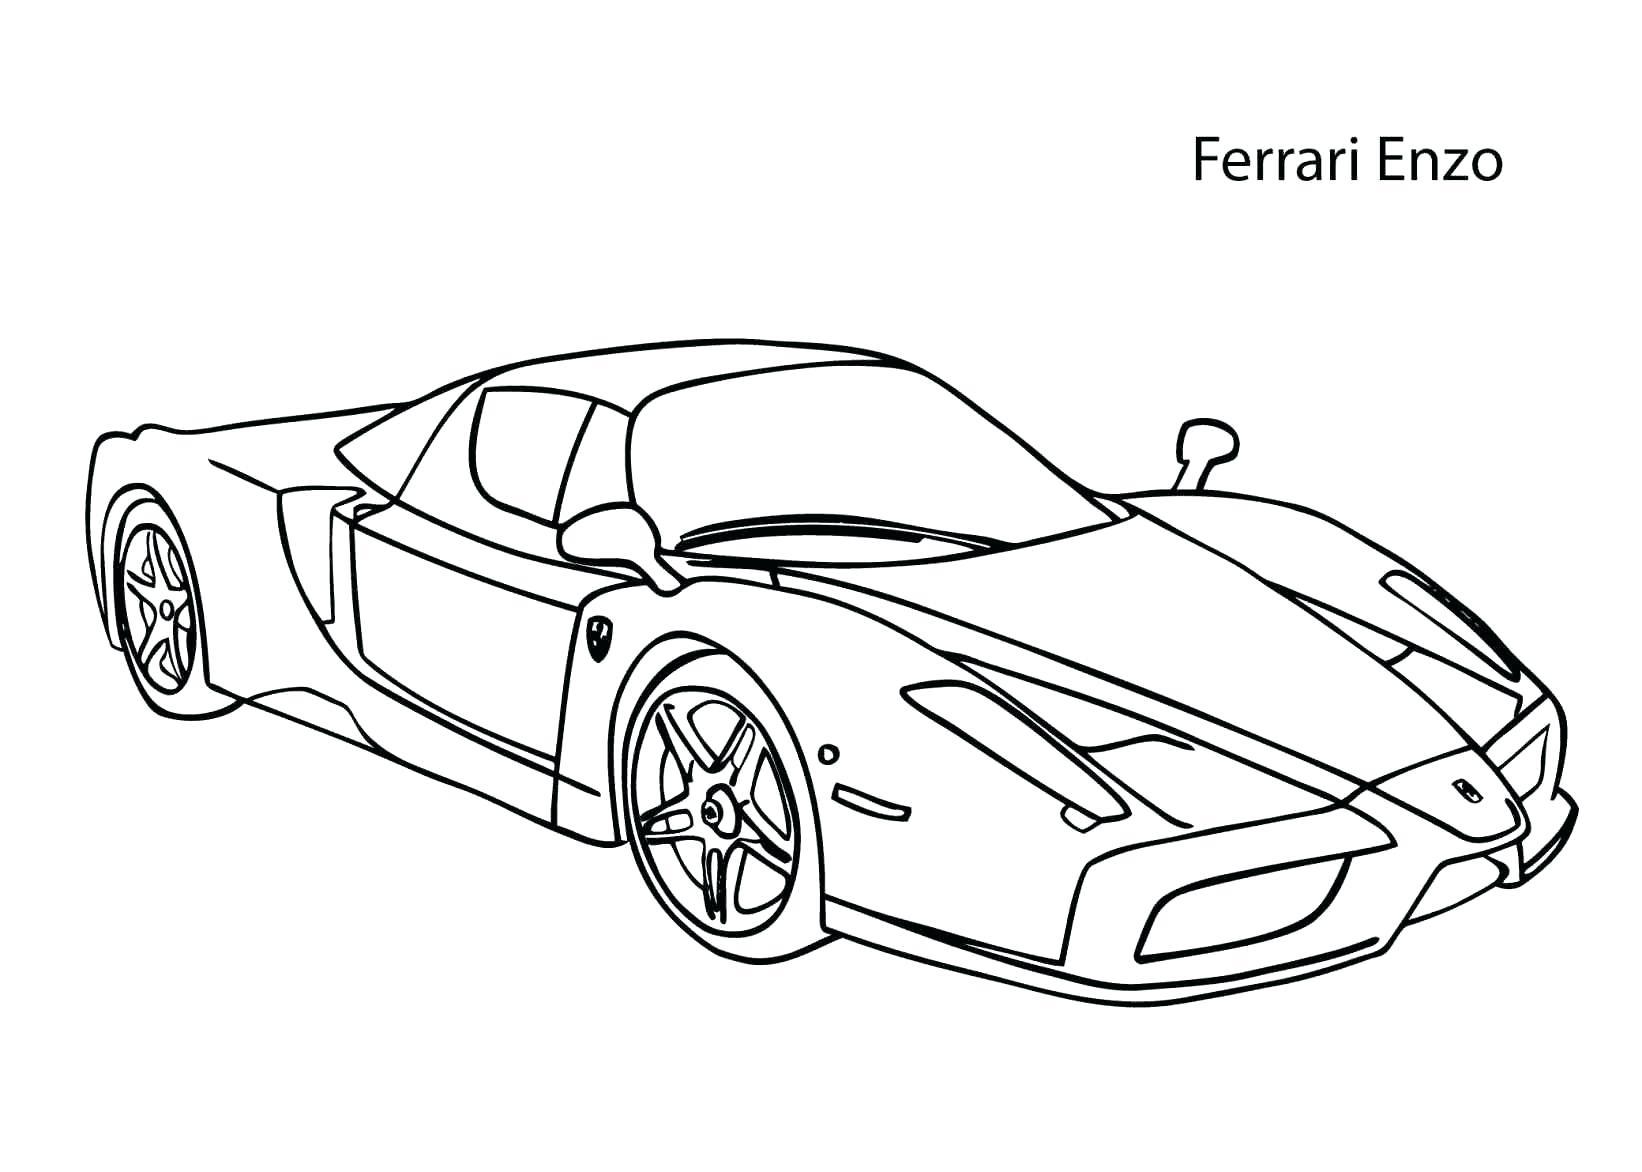 Nascar car drawing at getdrawings free for personal use nascar